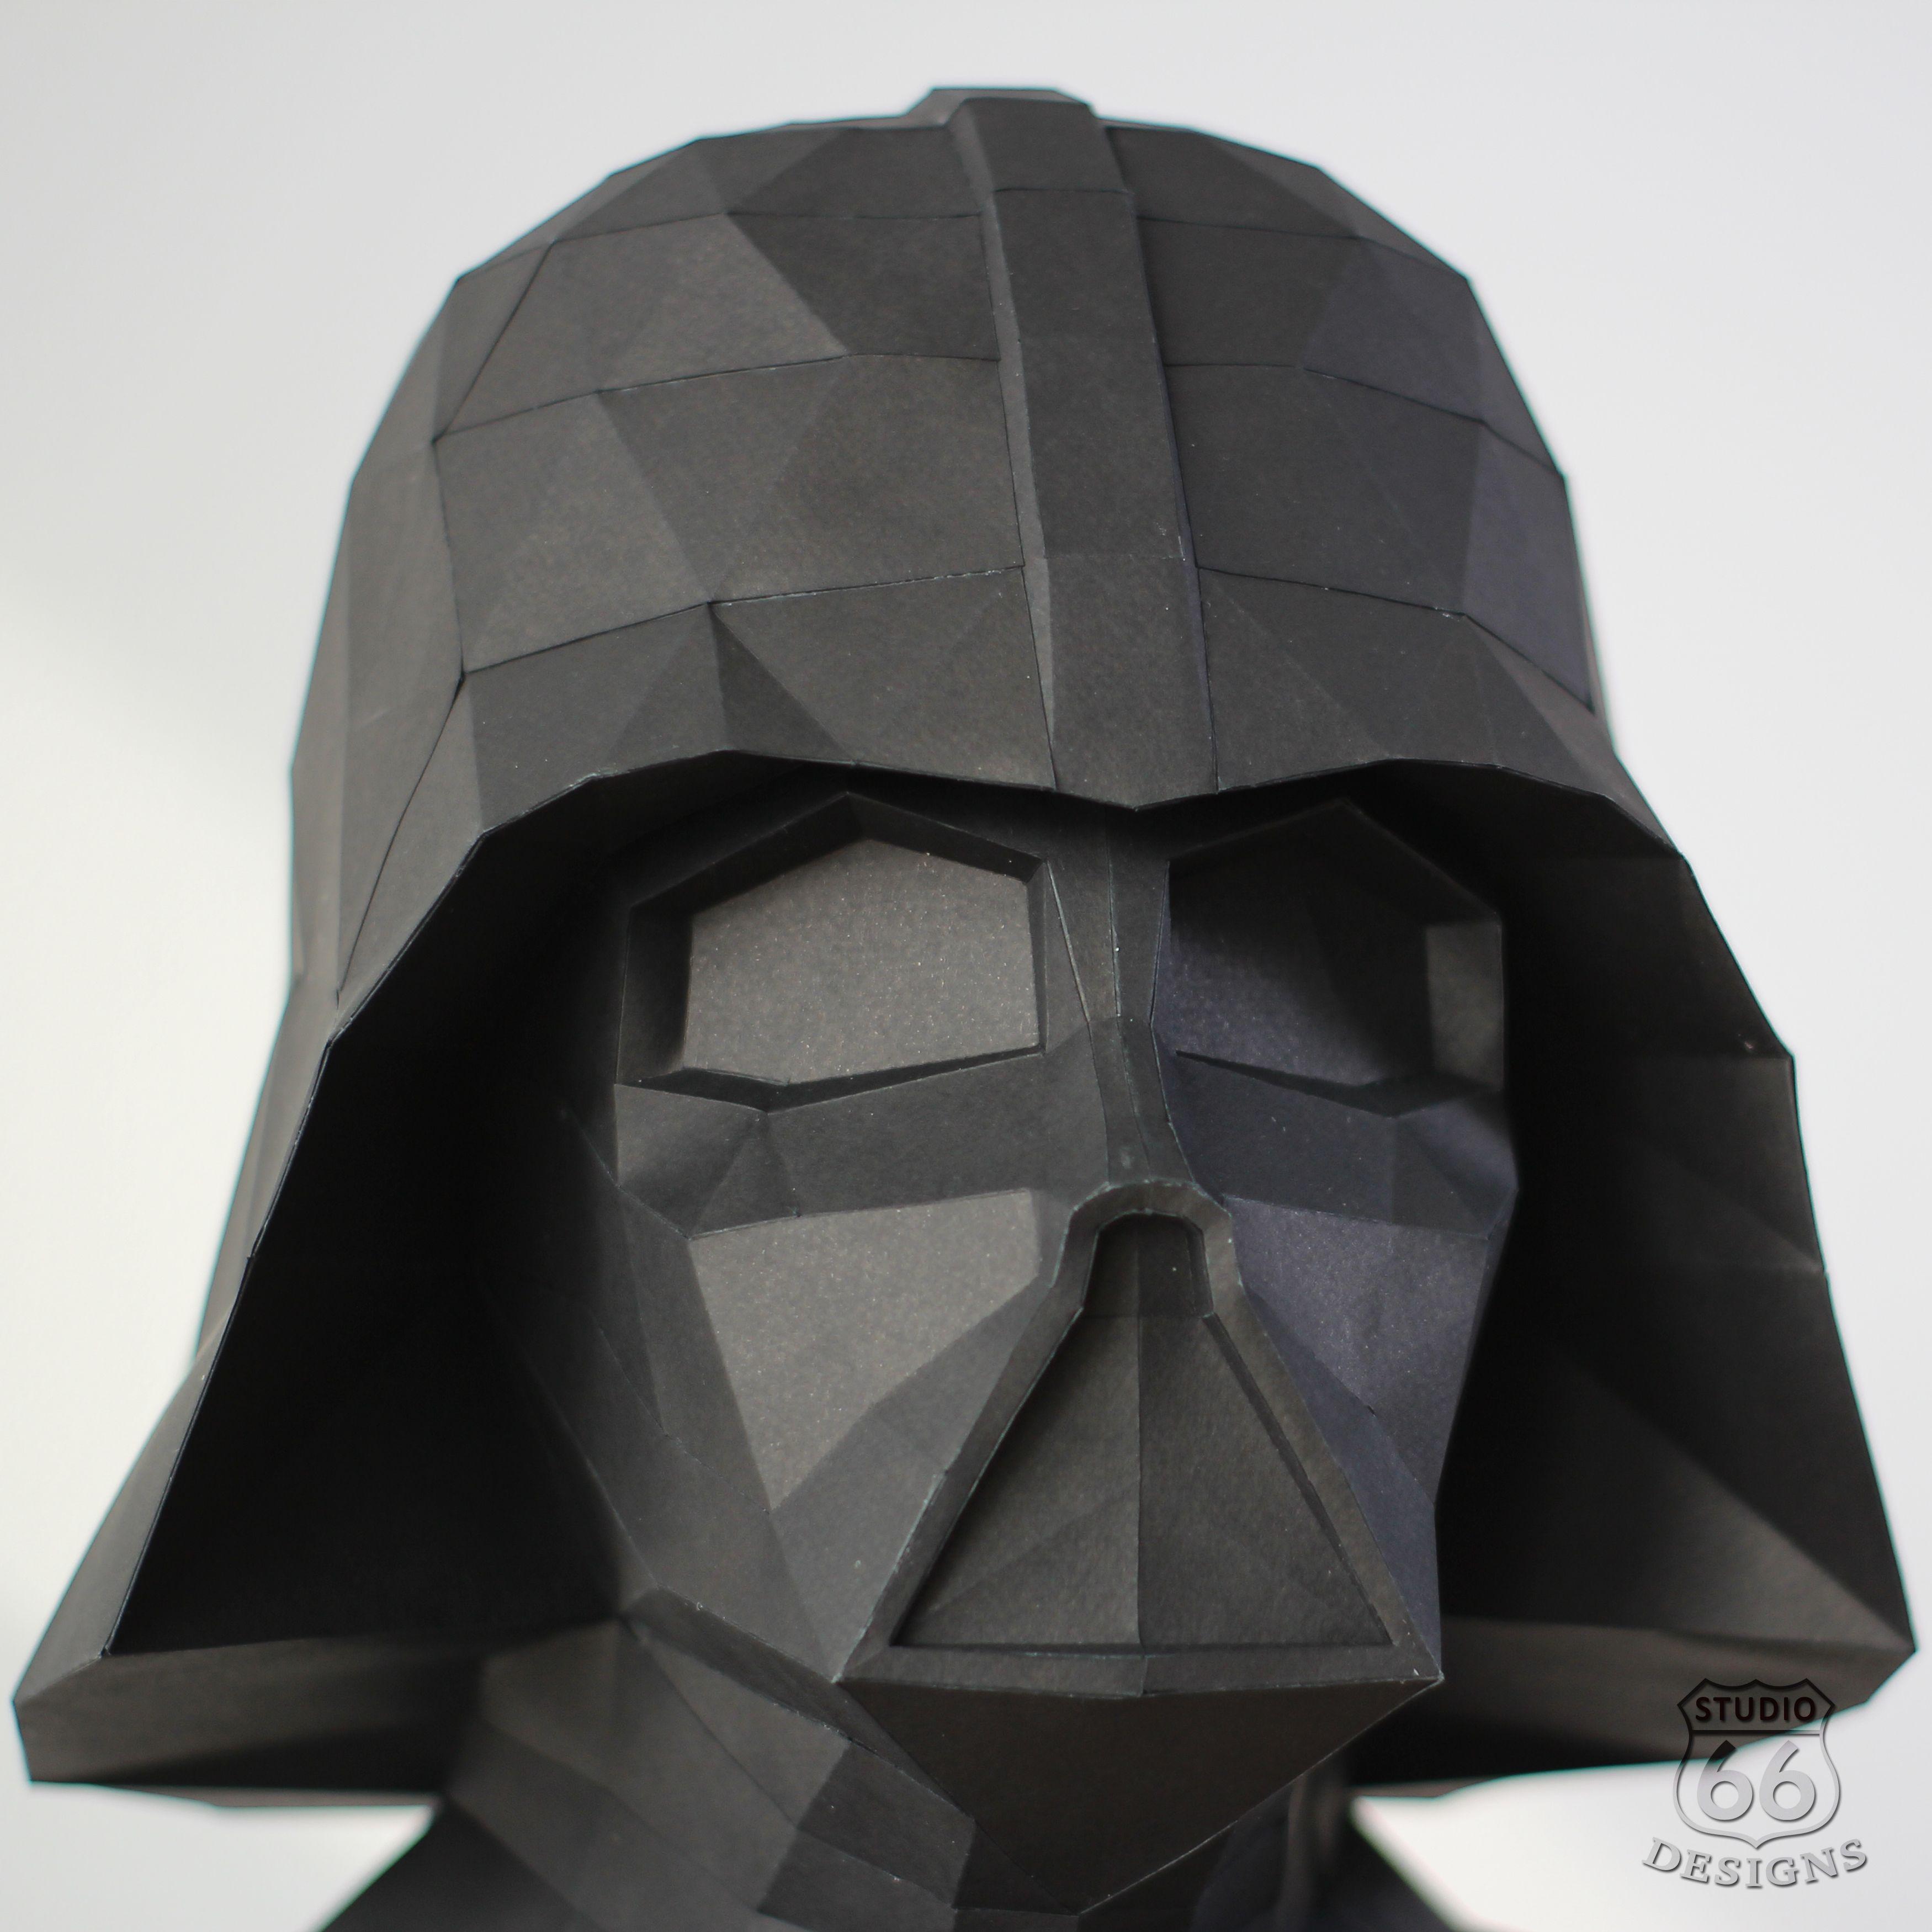 Papercraft Star Wars Make Your Own Darth Vader Statue Papercraft Darth Vader Paper Statue Home Decor 3d Papercraft Diy Pdf Pattern Darth Vader Statue Darth Vader Paper Crafts